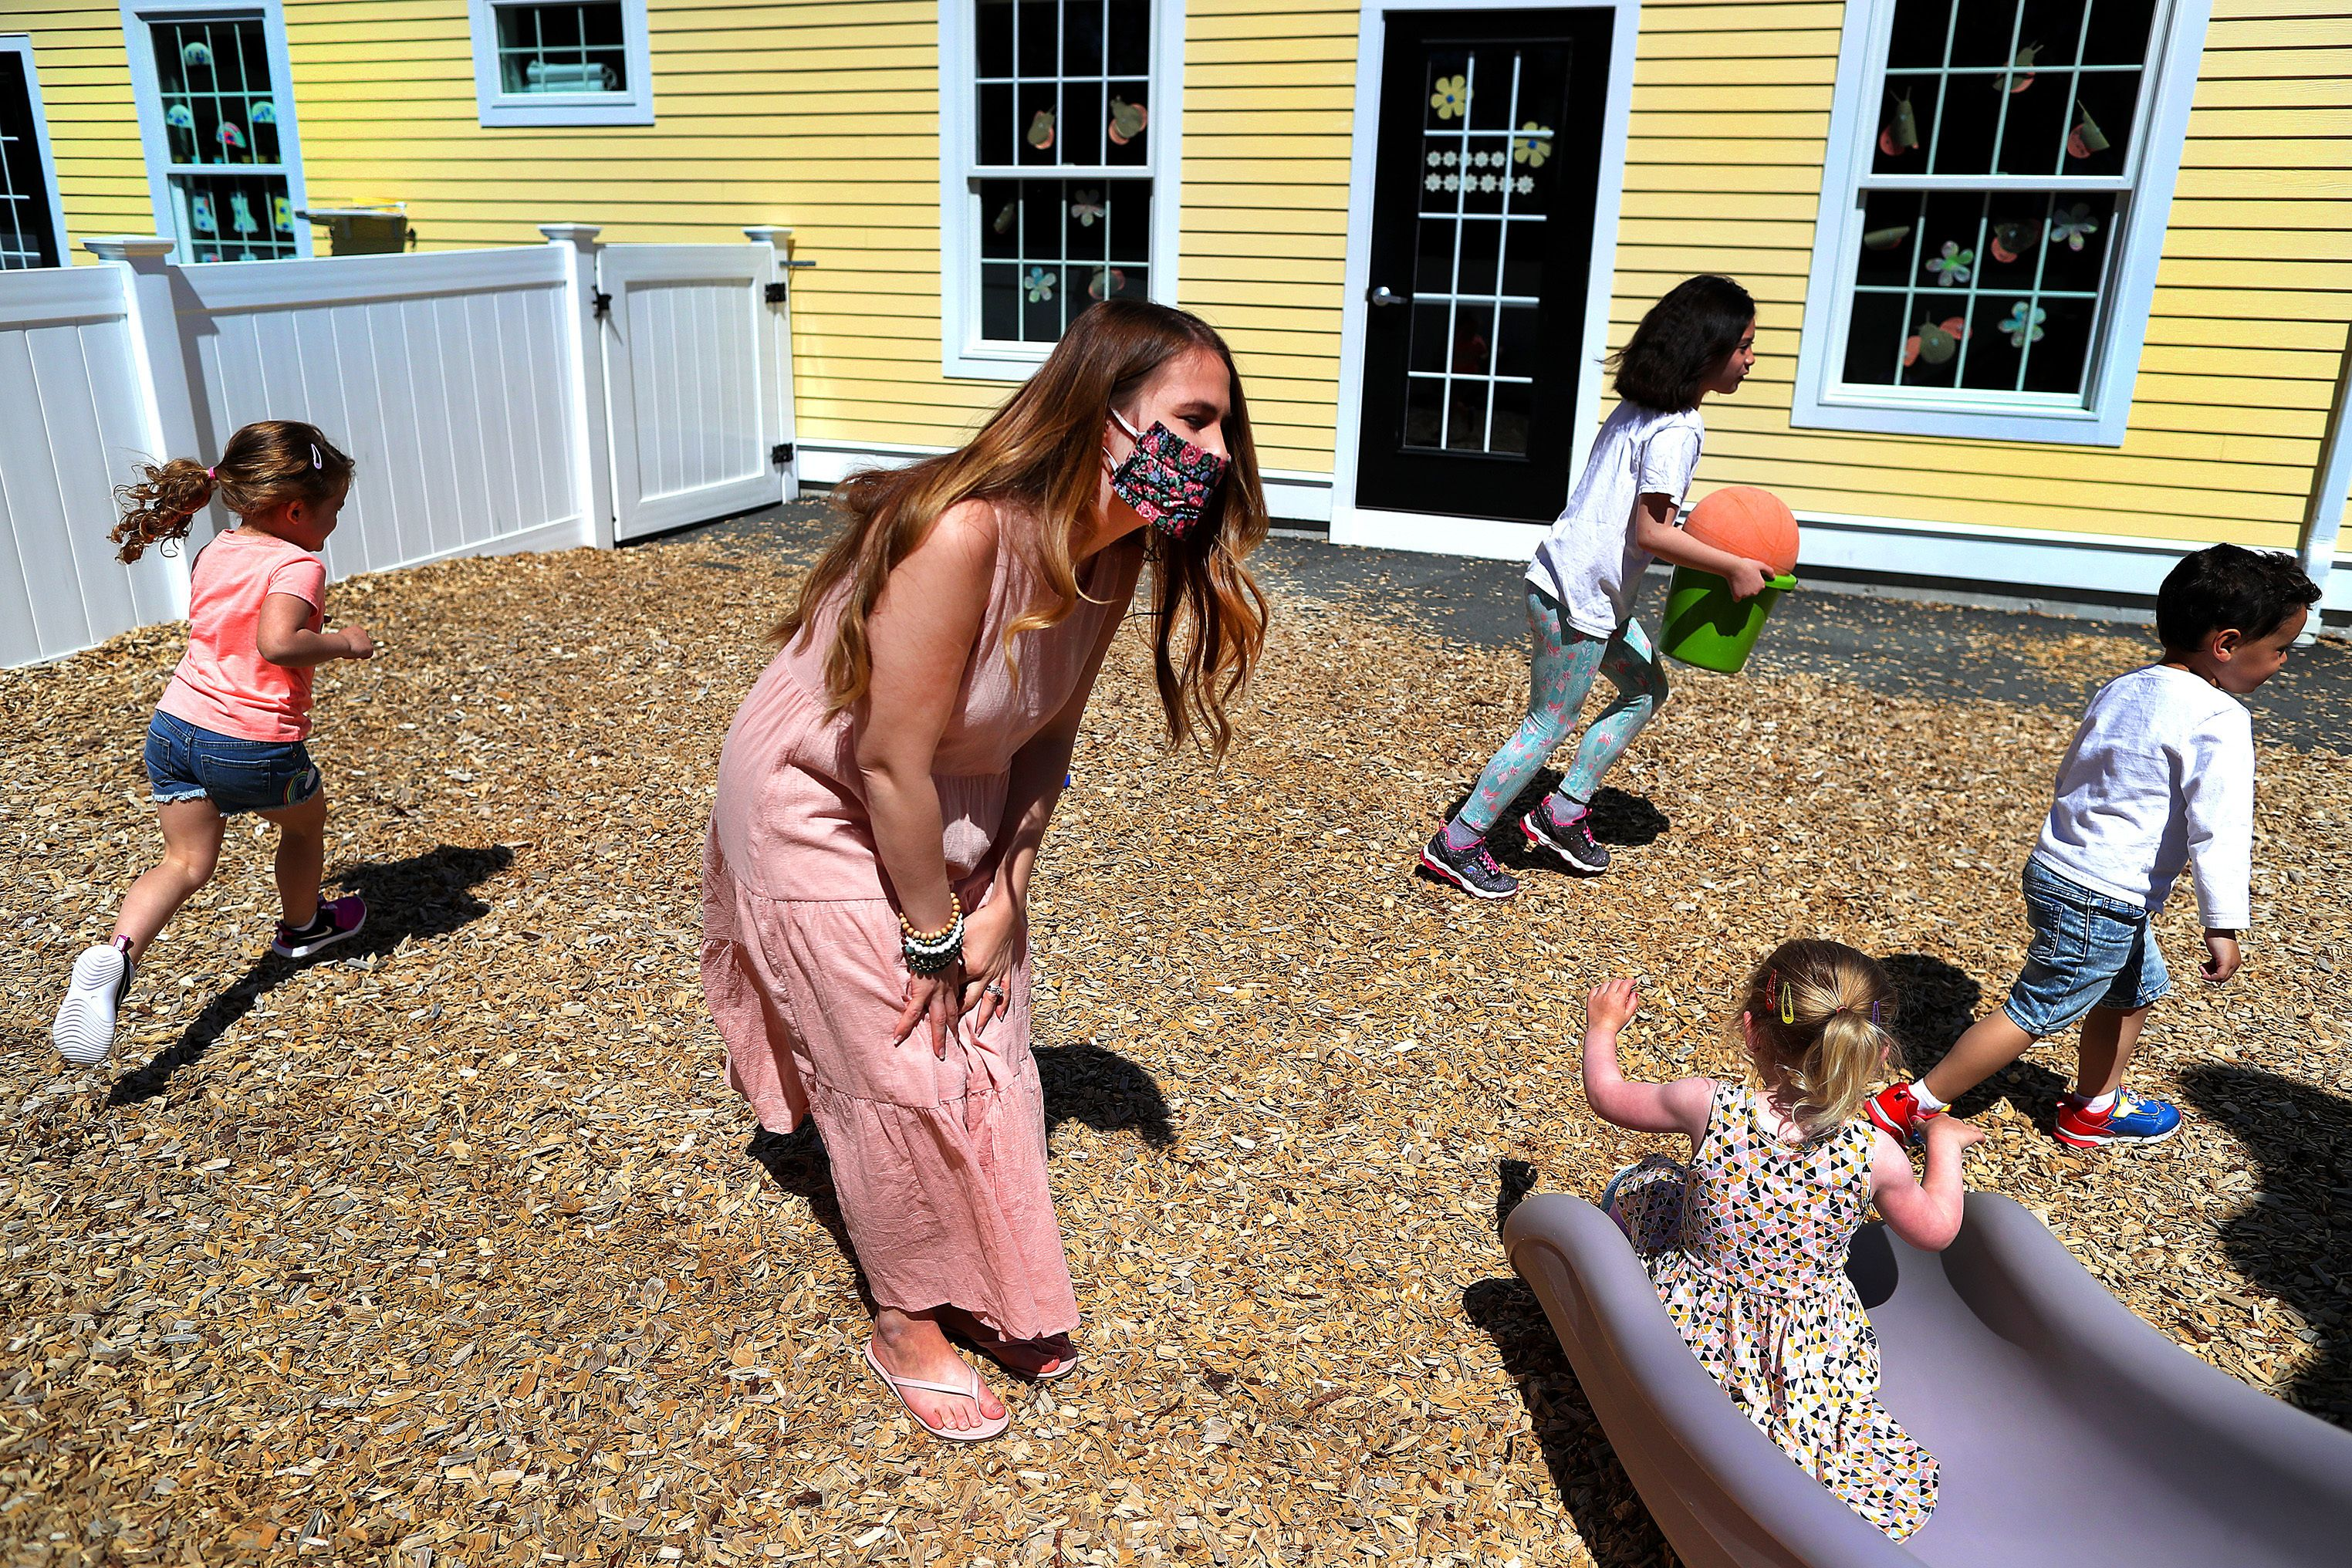 Preschool teacher Jenna Grenier keeps an eye on the children at Magical Beginnings Learning Academy in Middleton, Massachuset